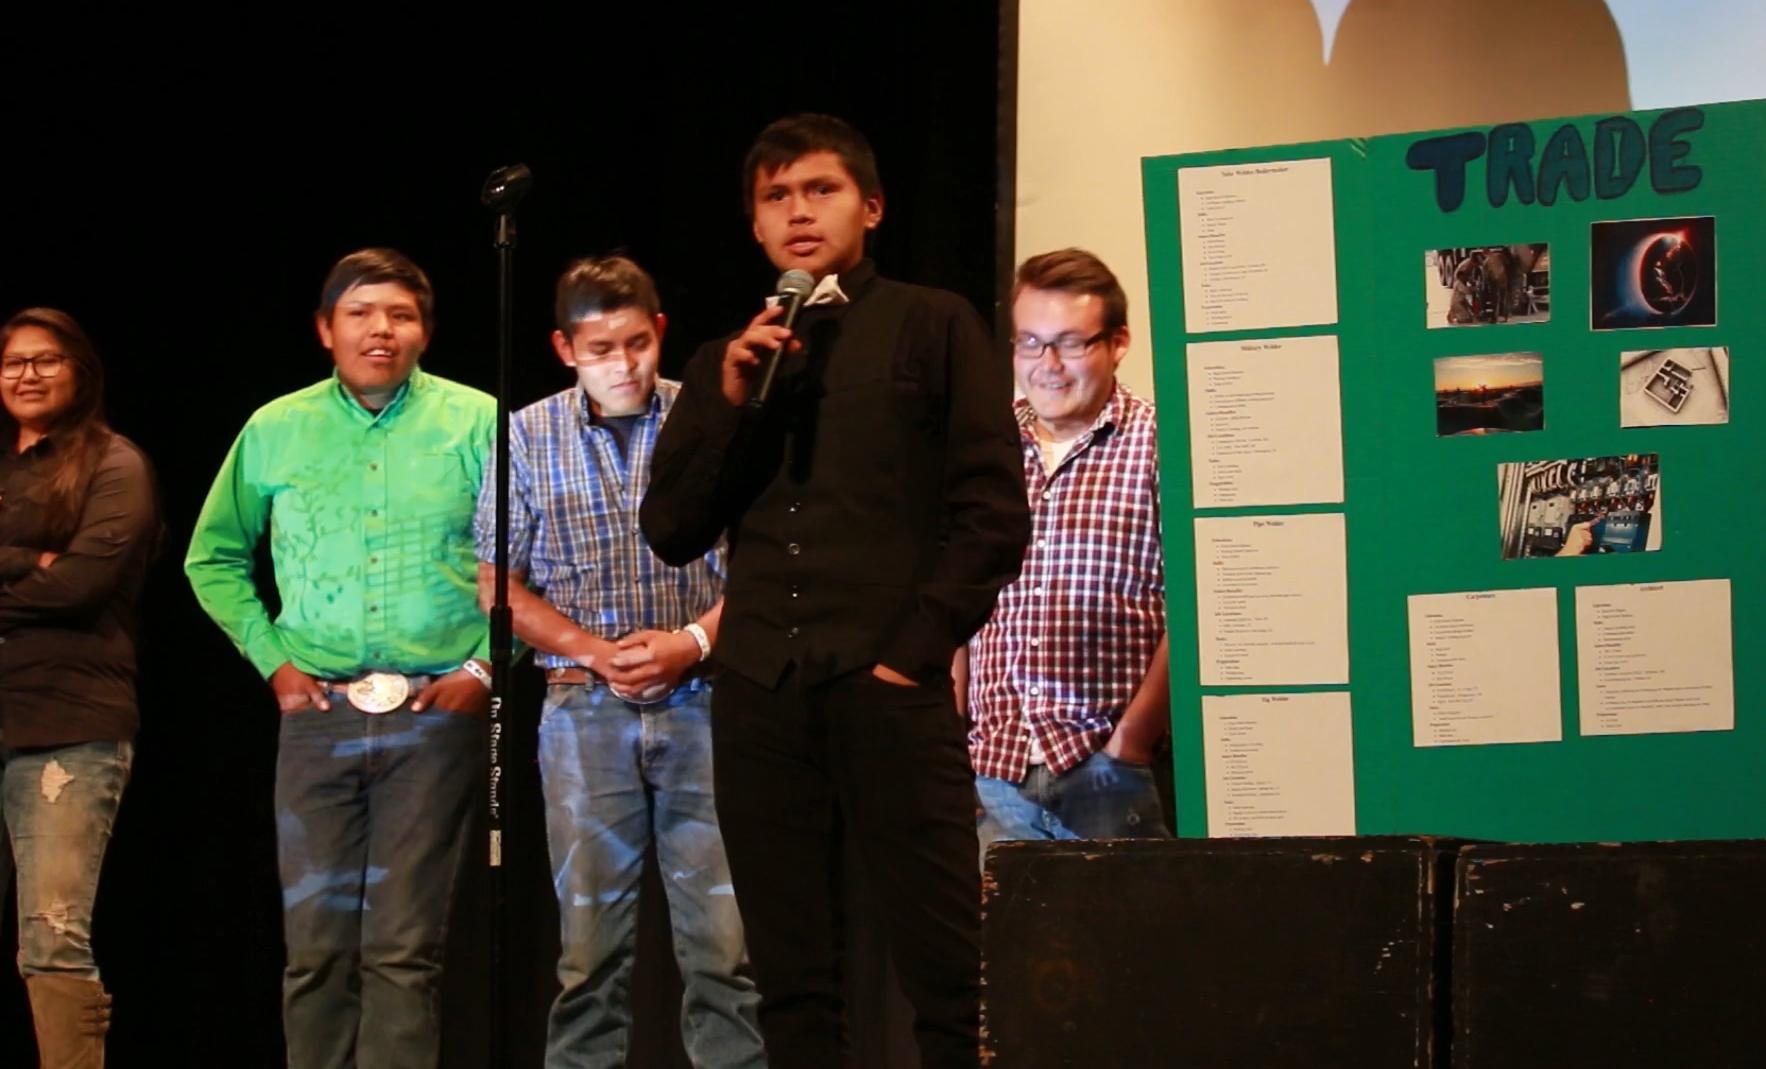 Student at Whitehorse HS in Montezuma Creek, UT presenting his career goals at the school's Indigo Freshman Day.